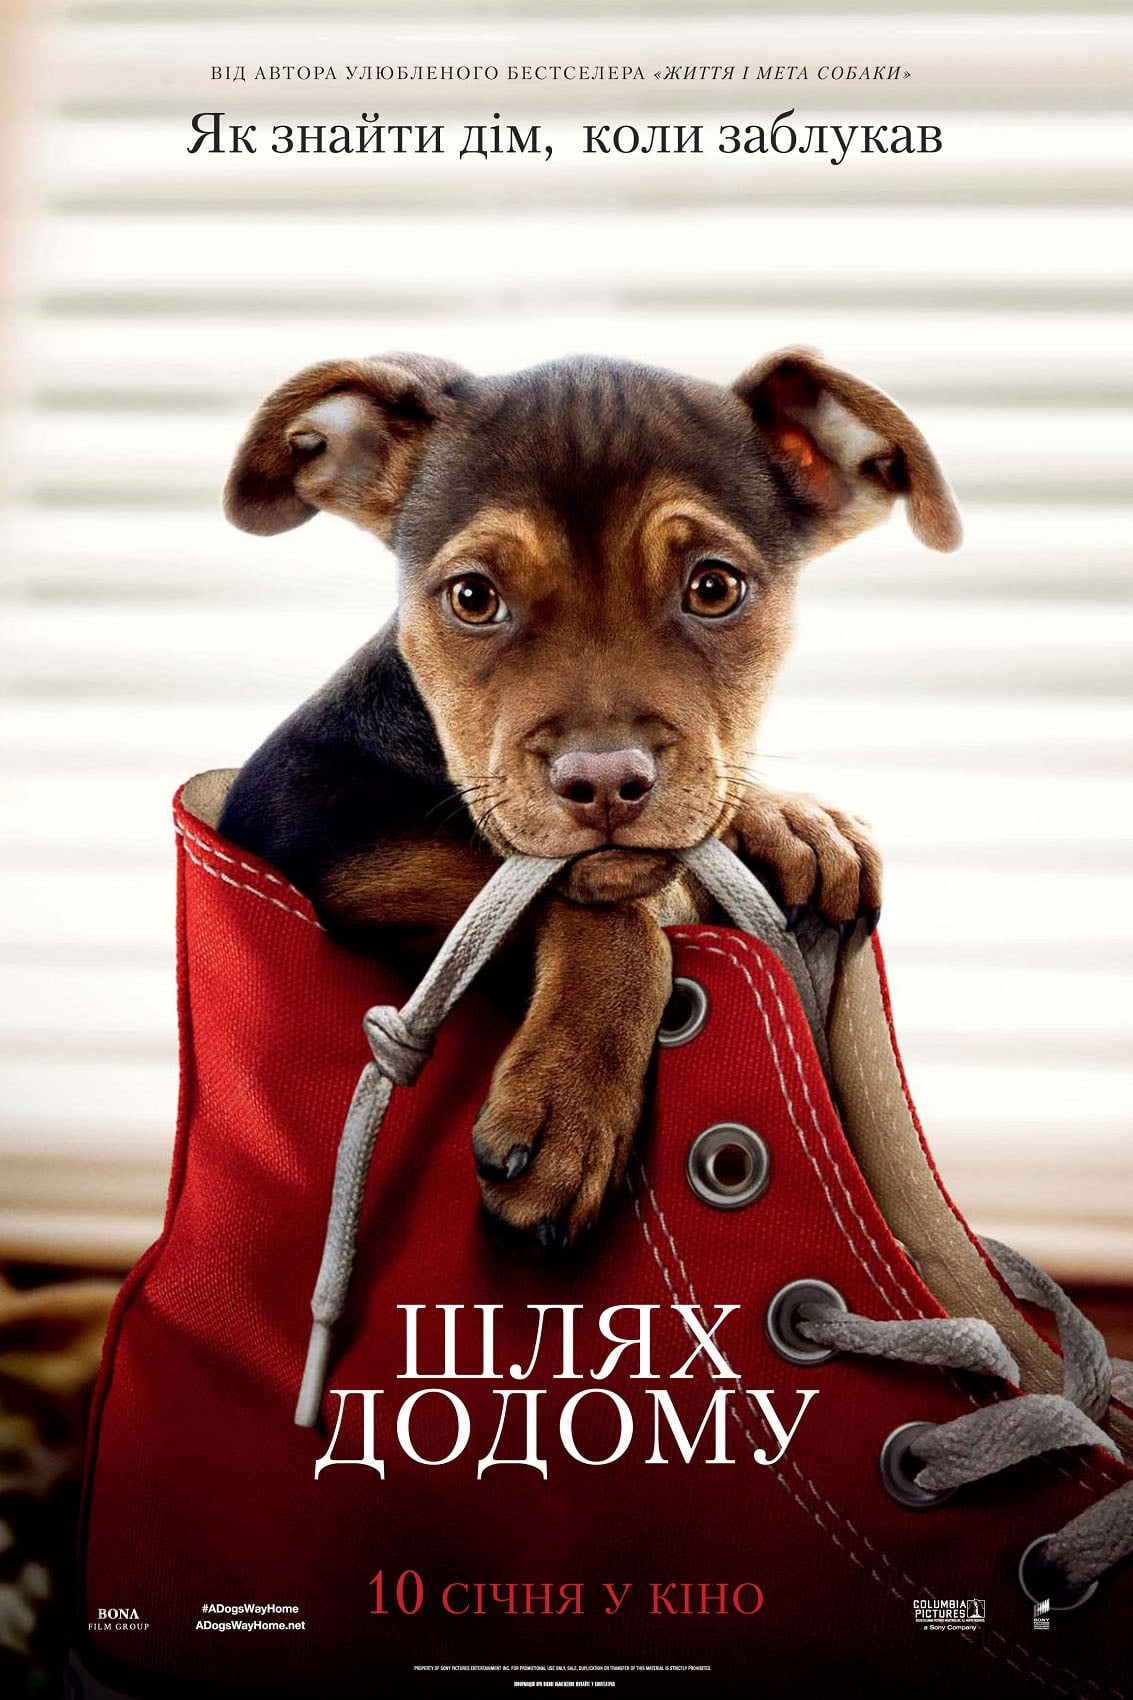 Poster and image movie Film A Dog's Way Home - Belos kelione namo -  2019